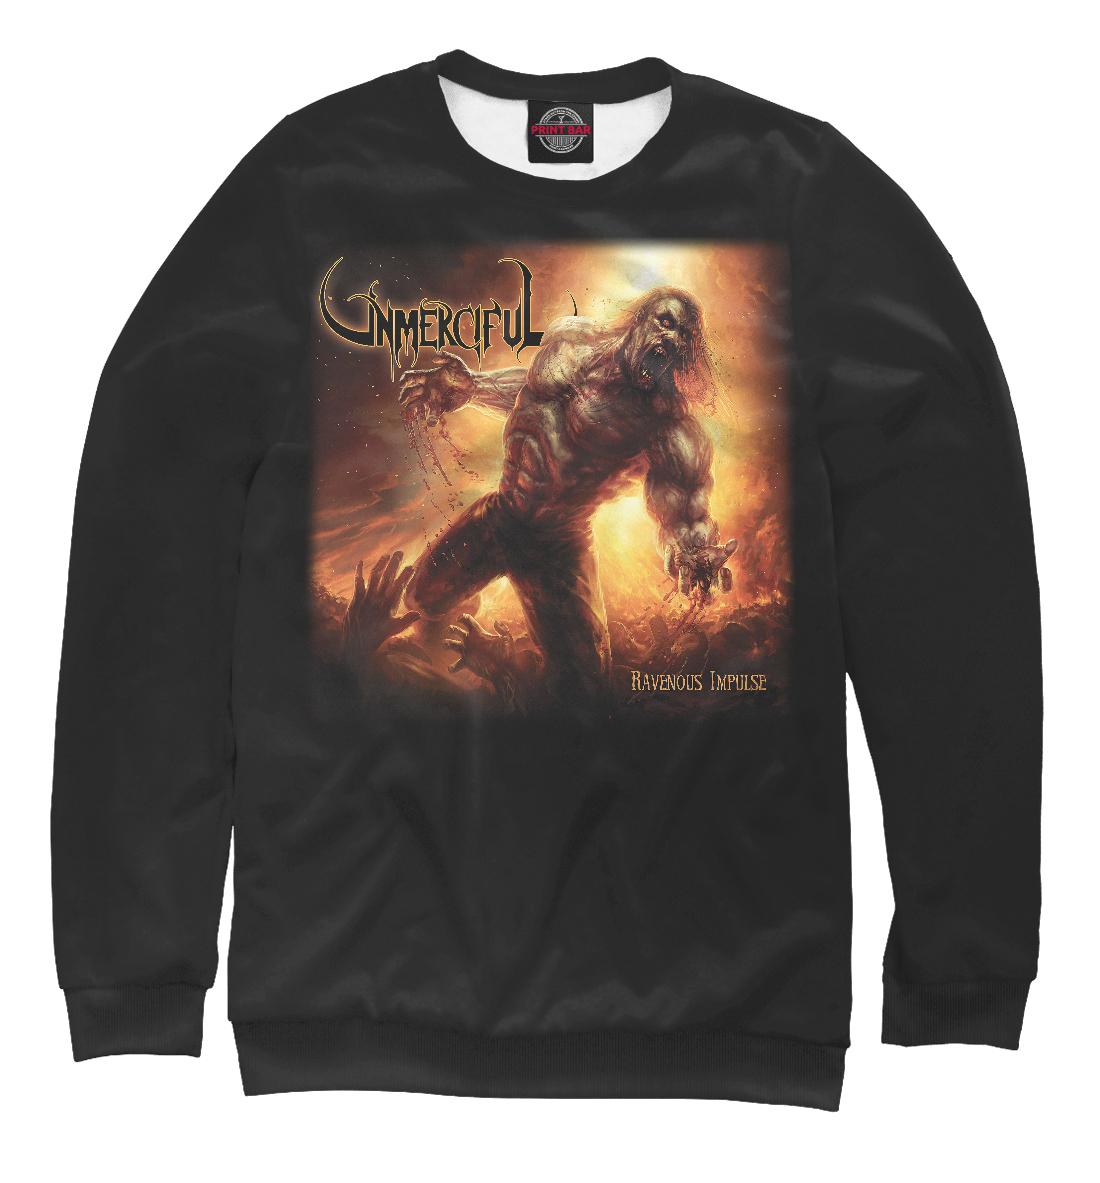 Купить Unmerciful - death metal band, Printbar, Свитшоты, MZK-277570-swi-2